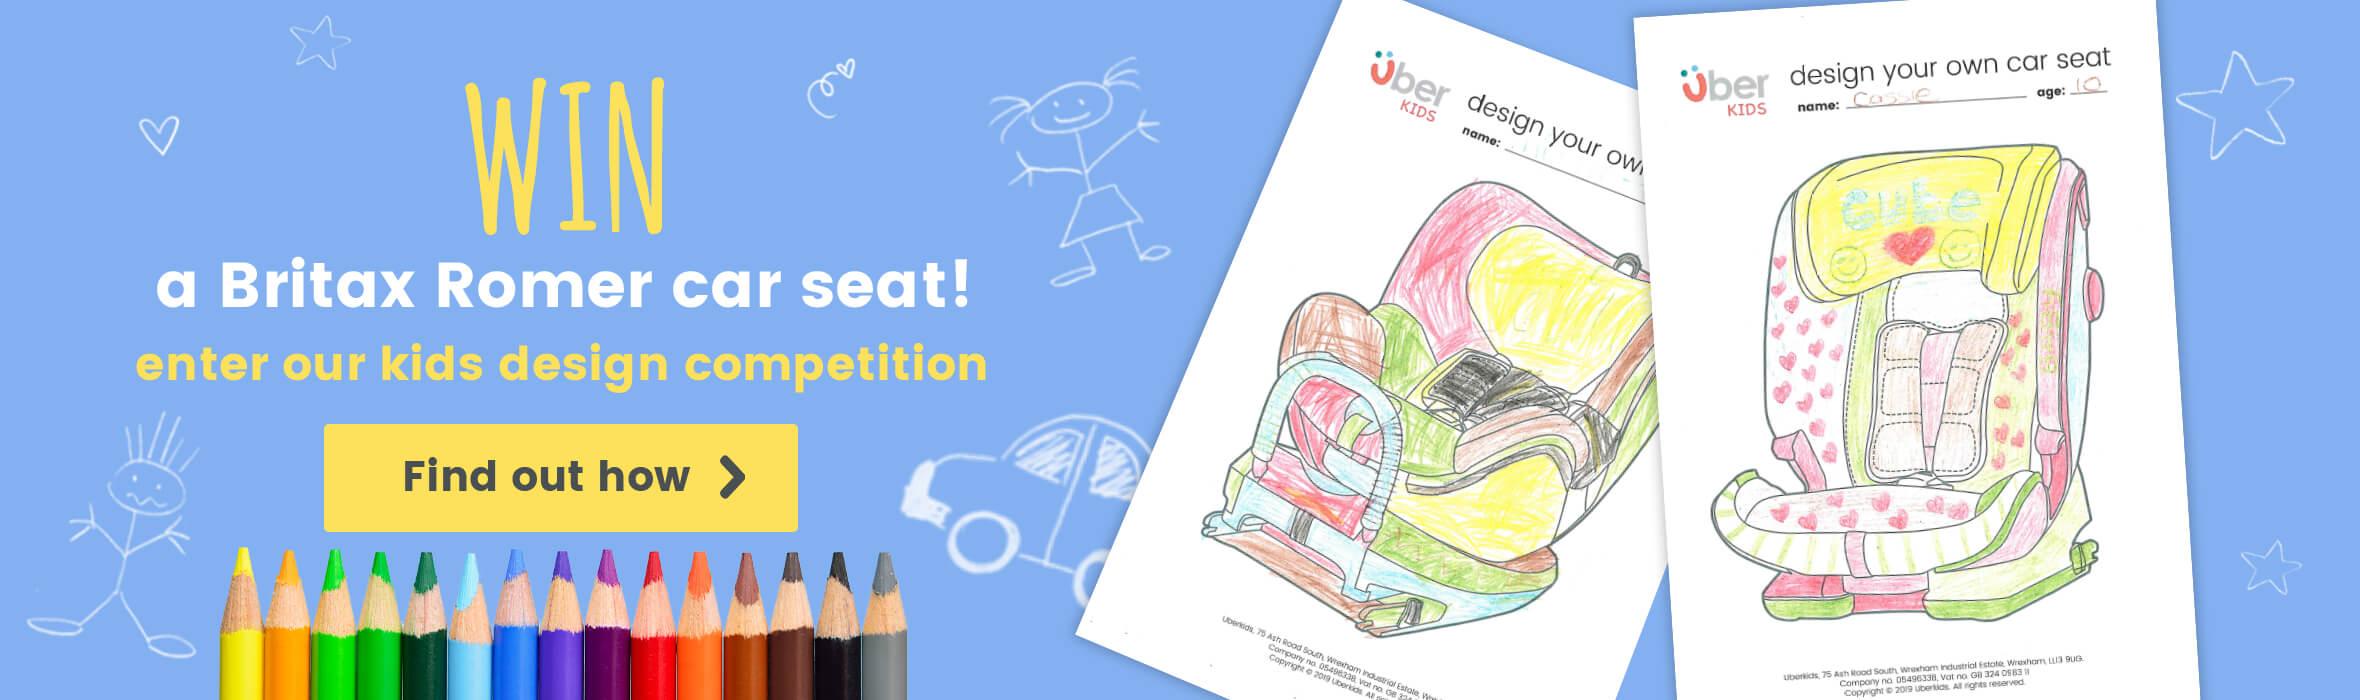 Win a Britax Romer Car Seat!